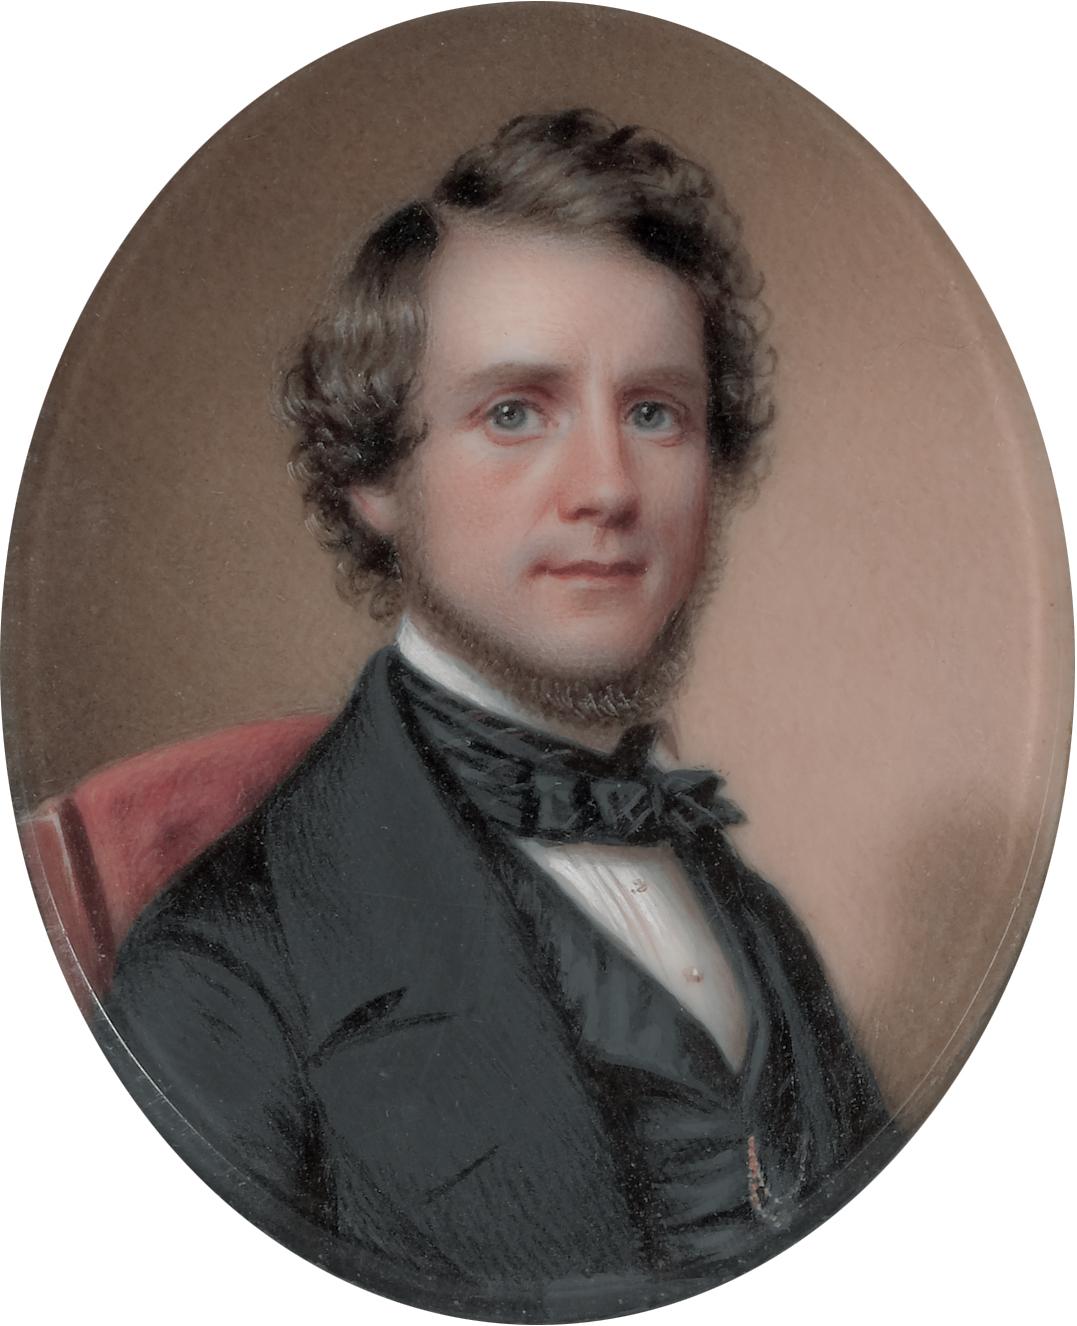 Image of John Wood Dodge from Wikidata